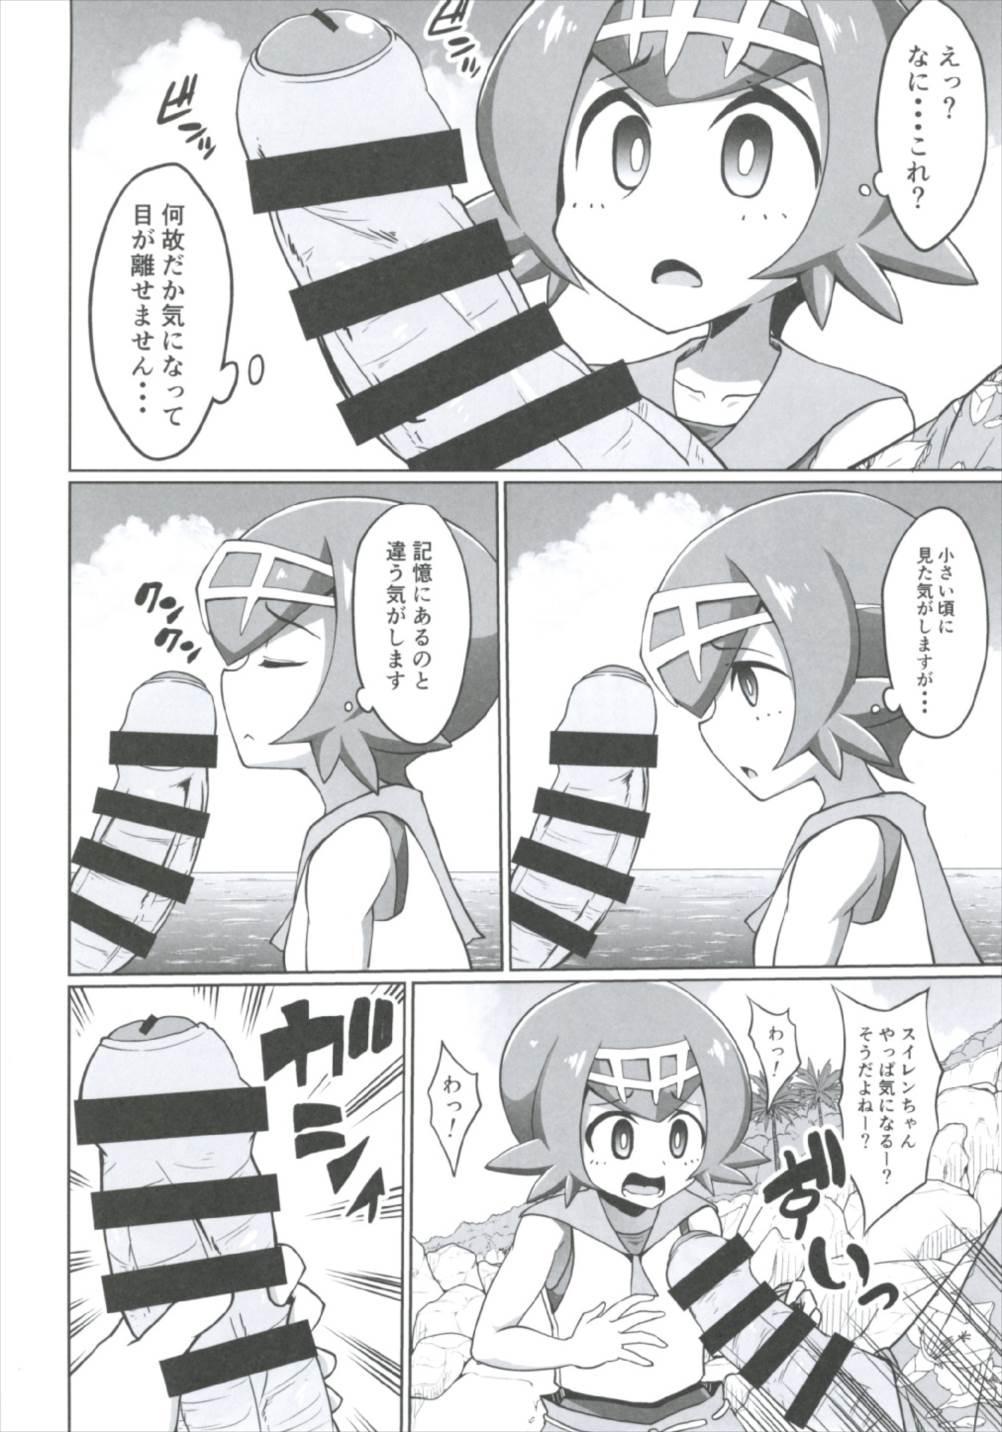 (C92) [Forever and ever (Eisen)] BOKKIMON -Suiren-chan wa H ni Kyoumi Shinshin- (Pokémon Sun and Moon) 5